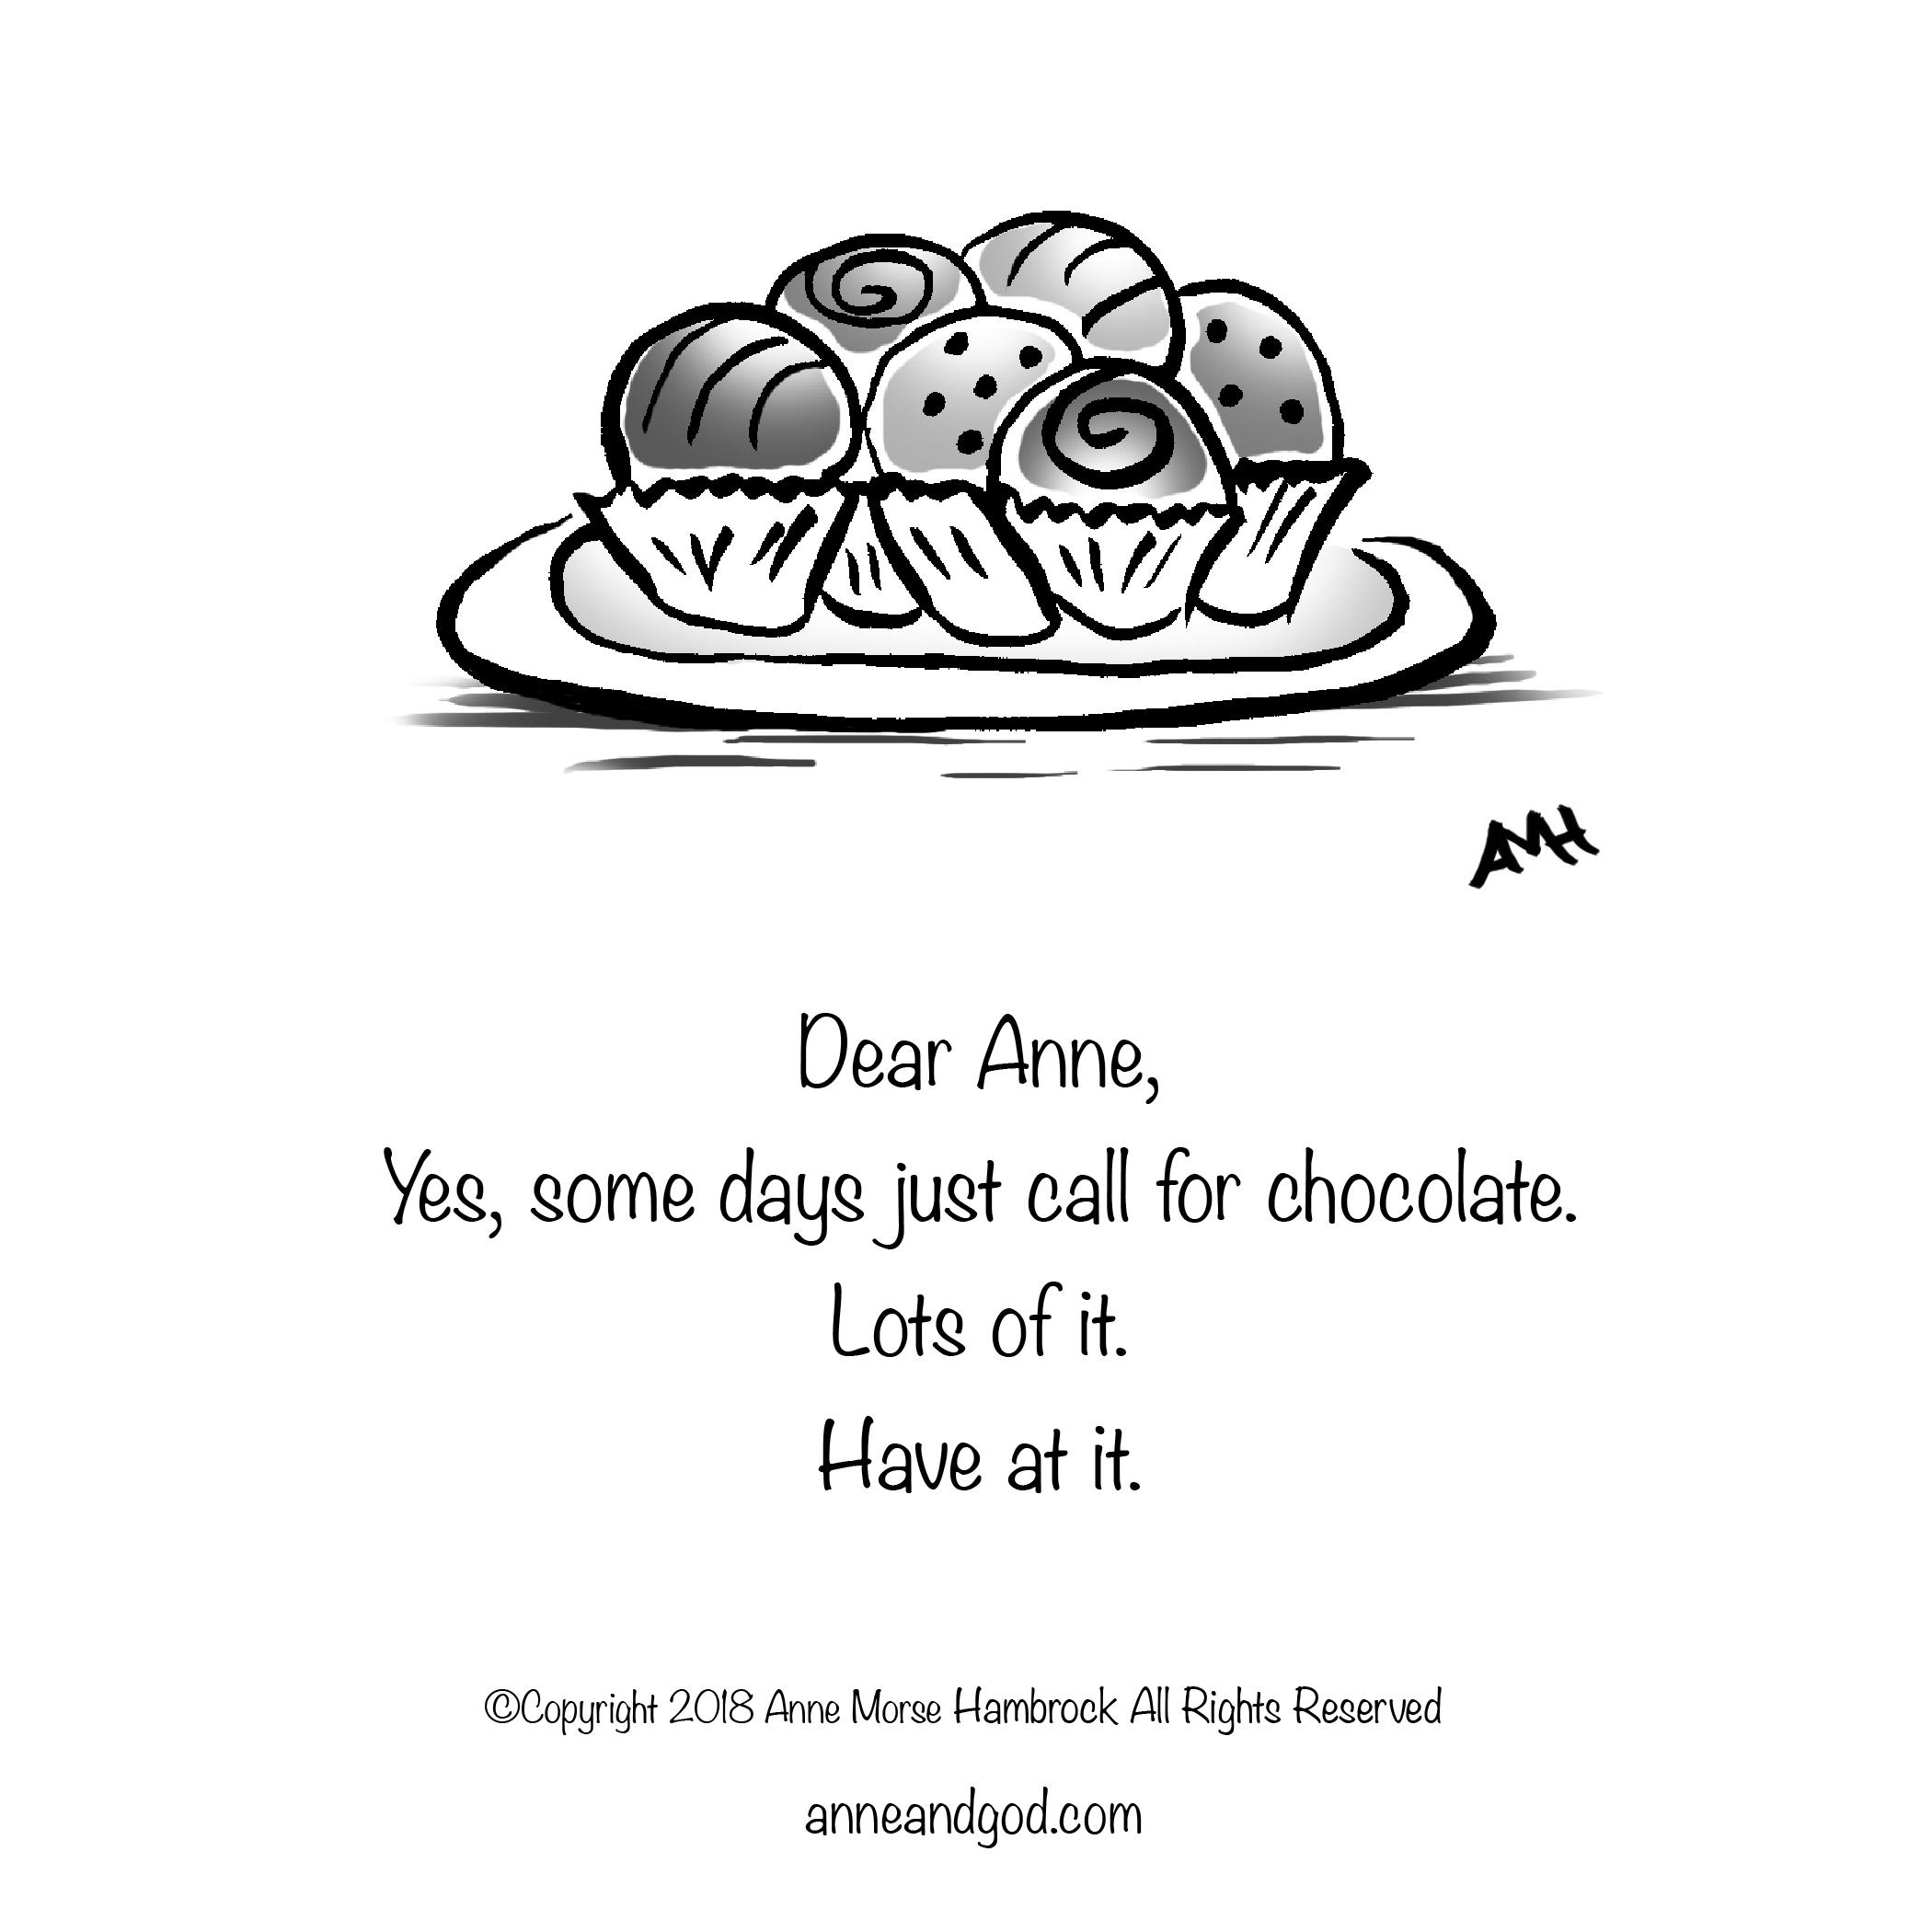 Chocolate Truffles Anne & God